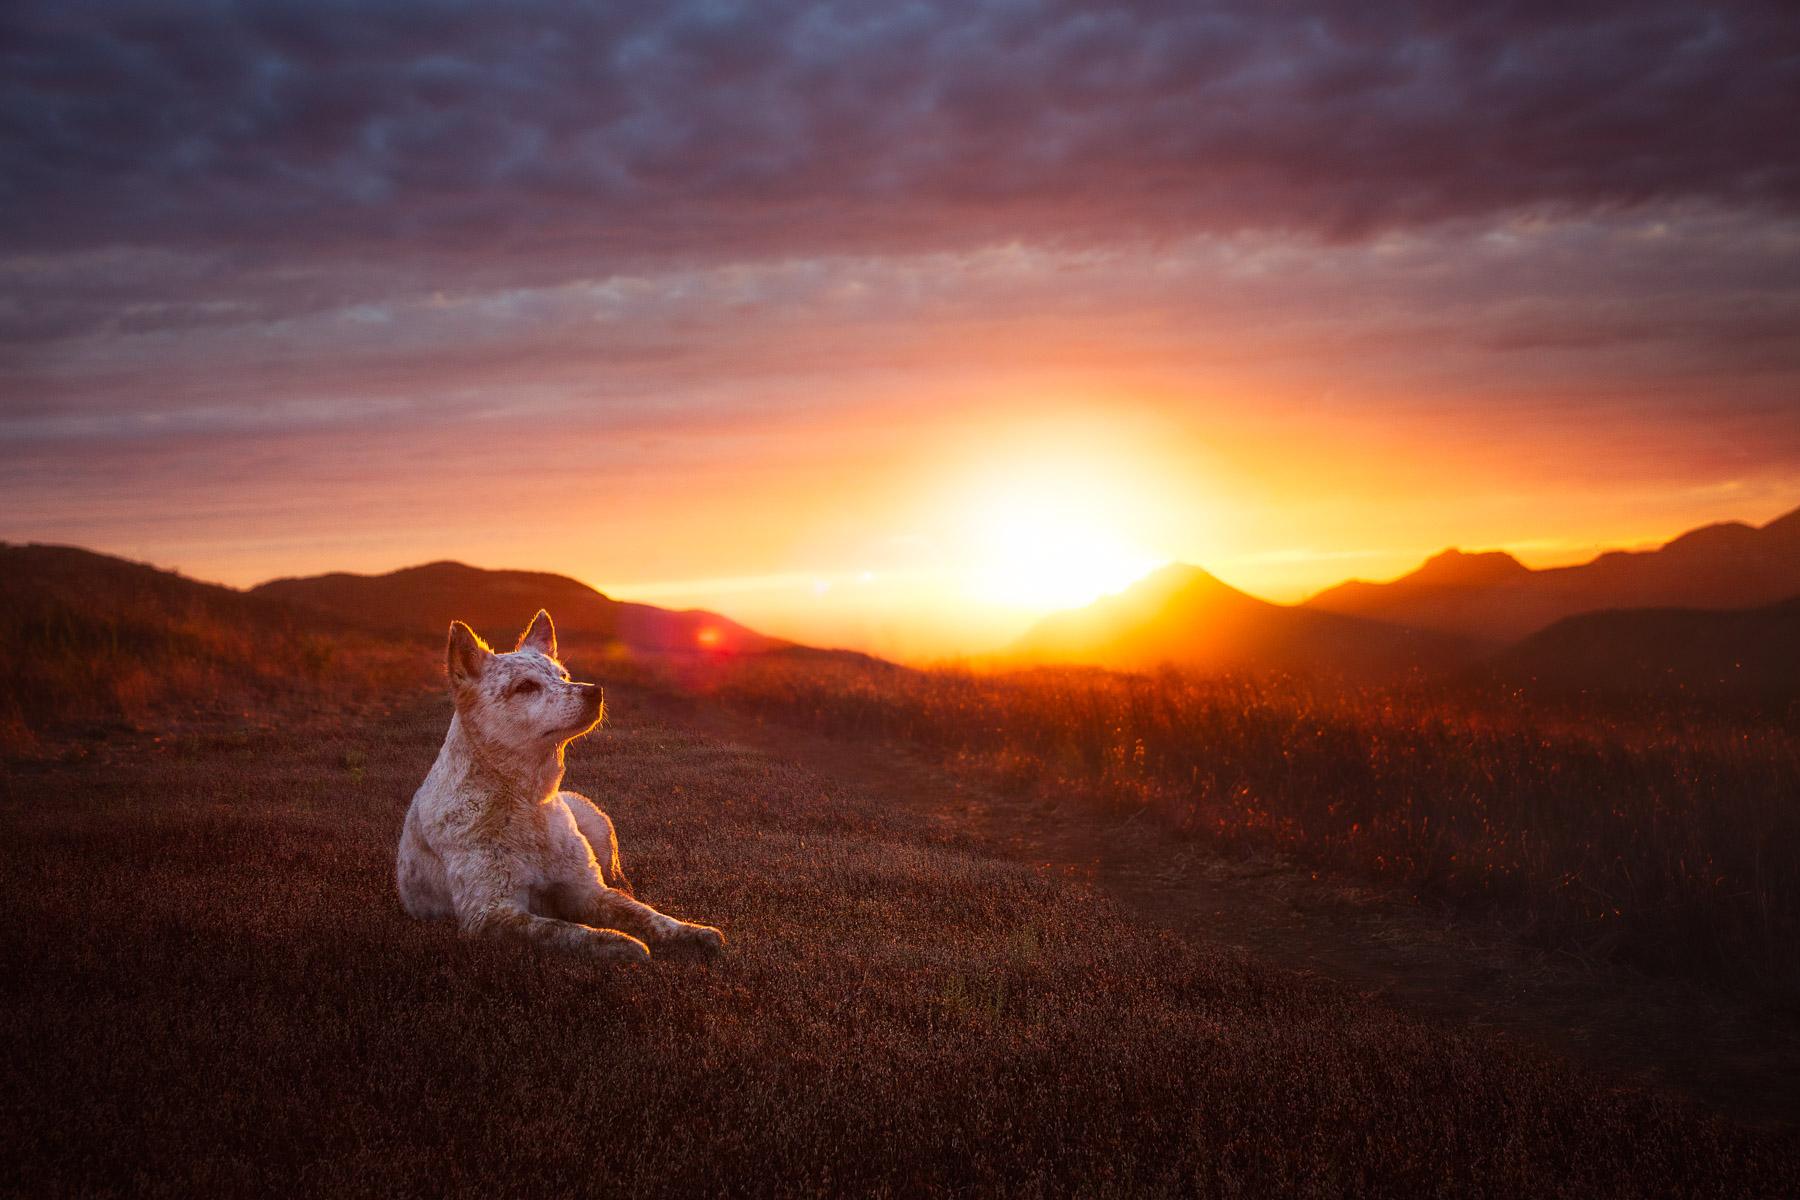 los-angeles-commercial-dog-photographer-for-pet-brands-23.jpg